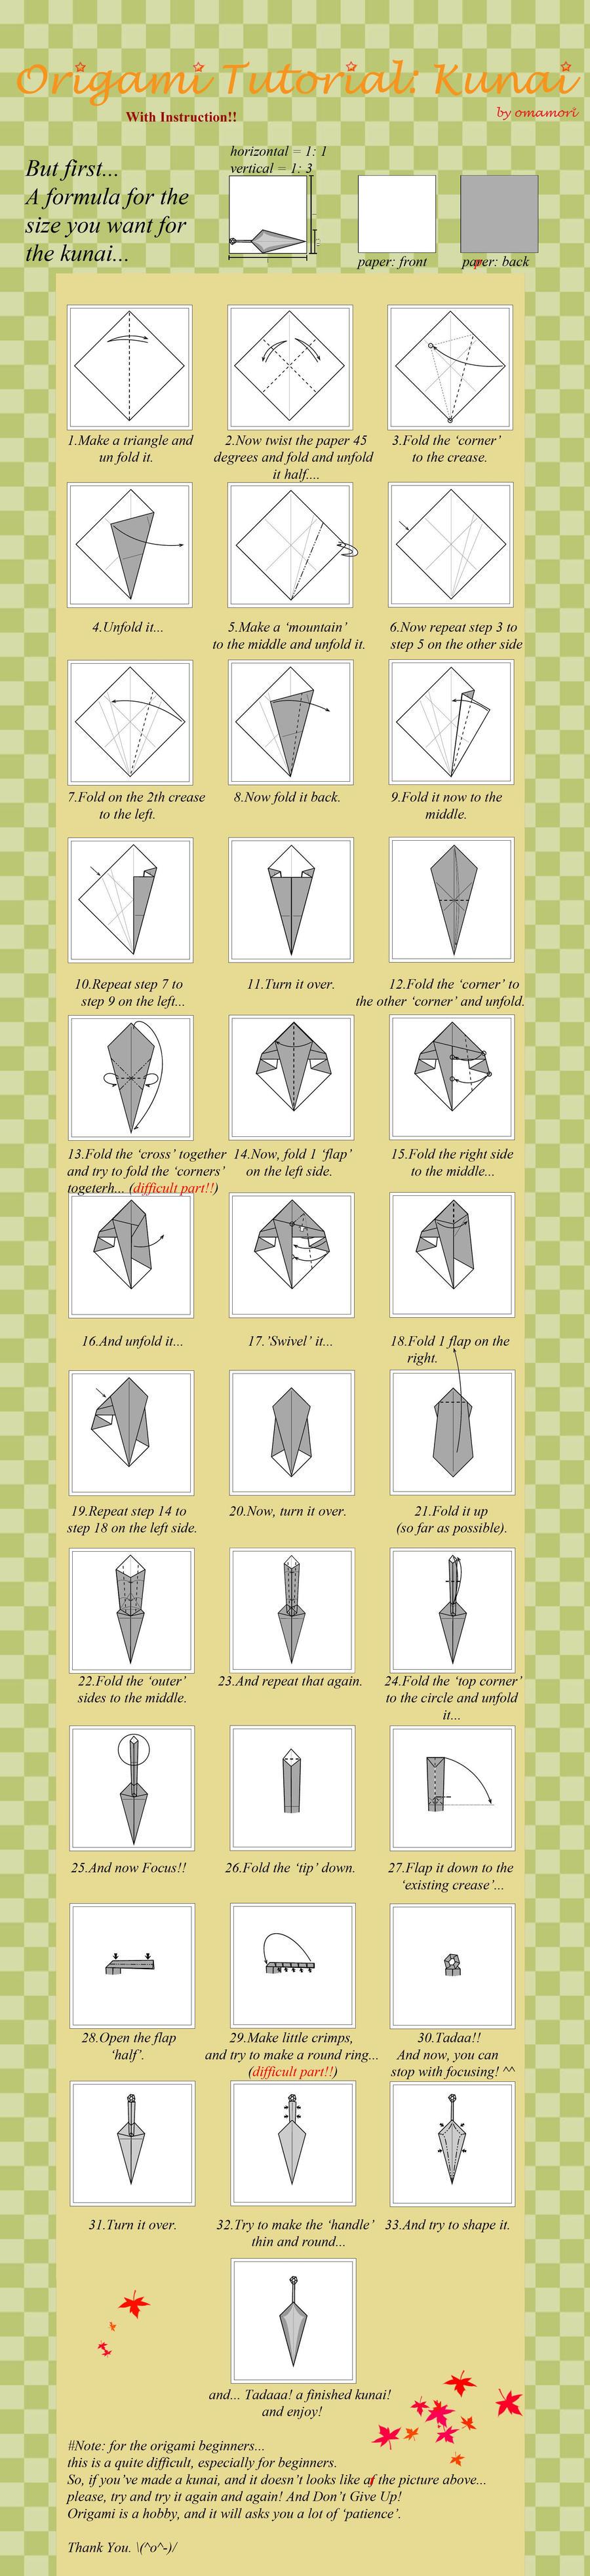 paper kunai Paper kunai tutorial - russian by sikarbi on deviantart paper kunai tutorial - russian by sikarbi on deviantart.